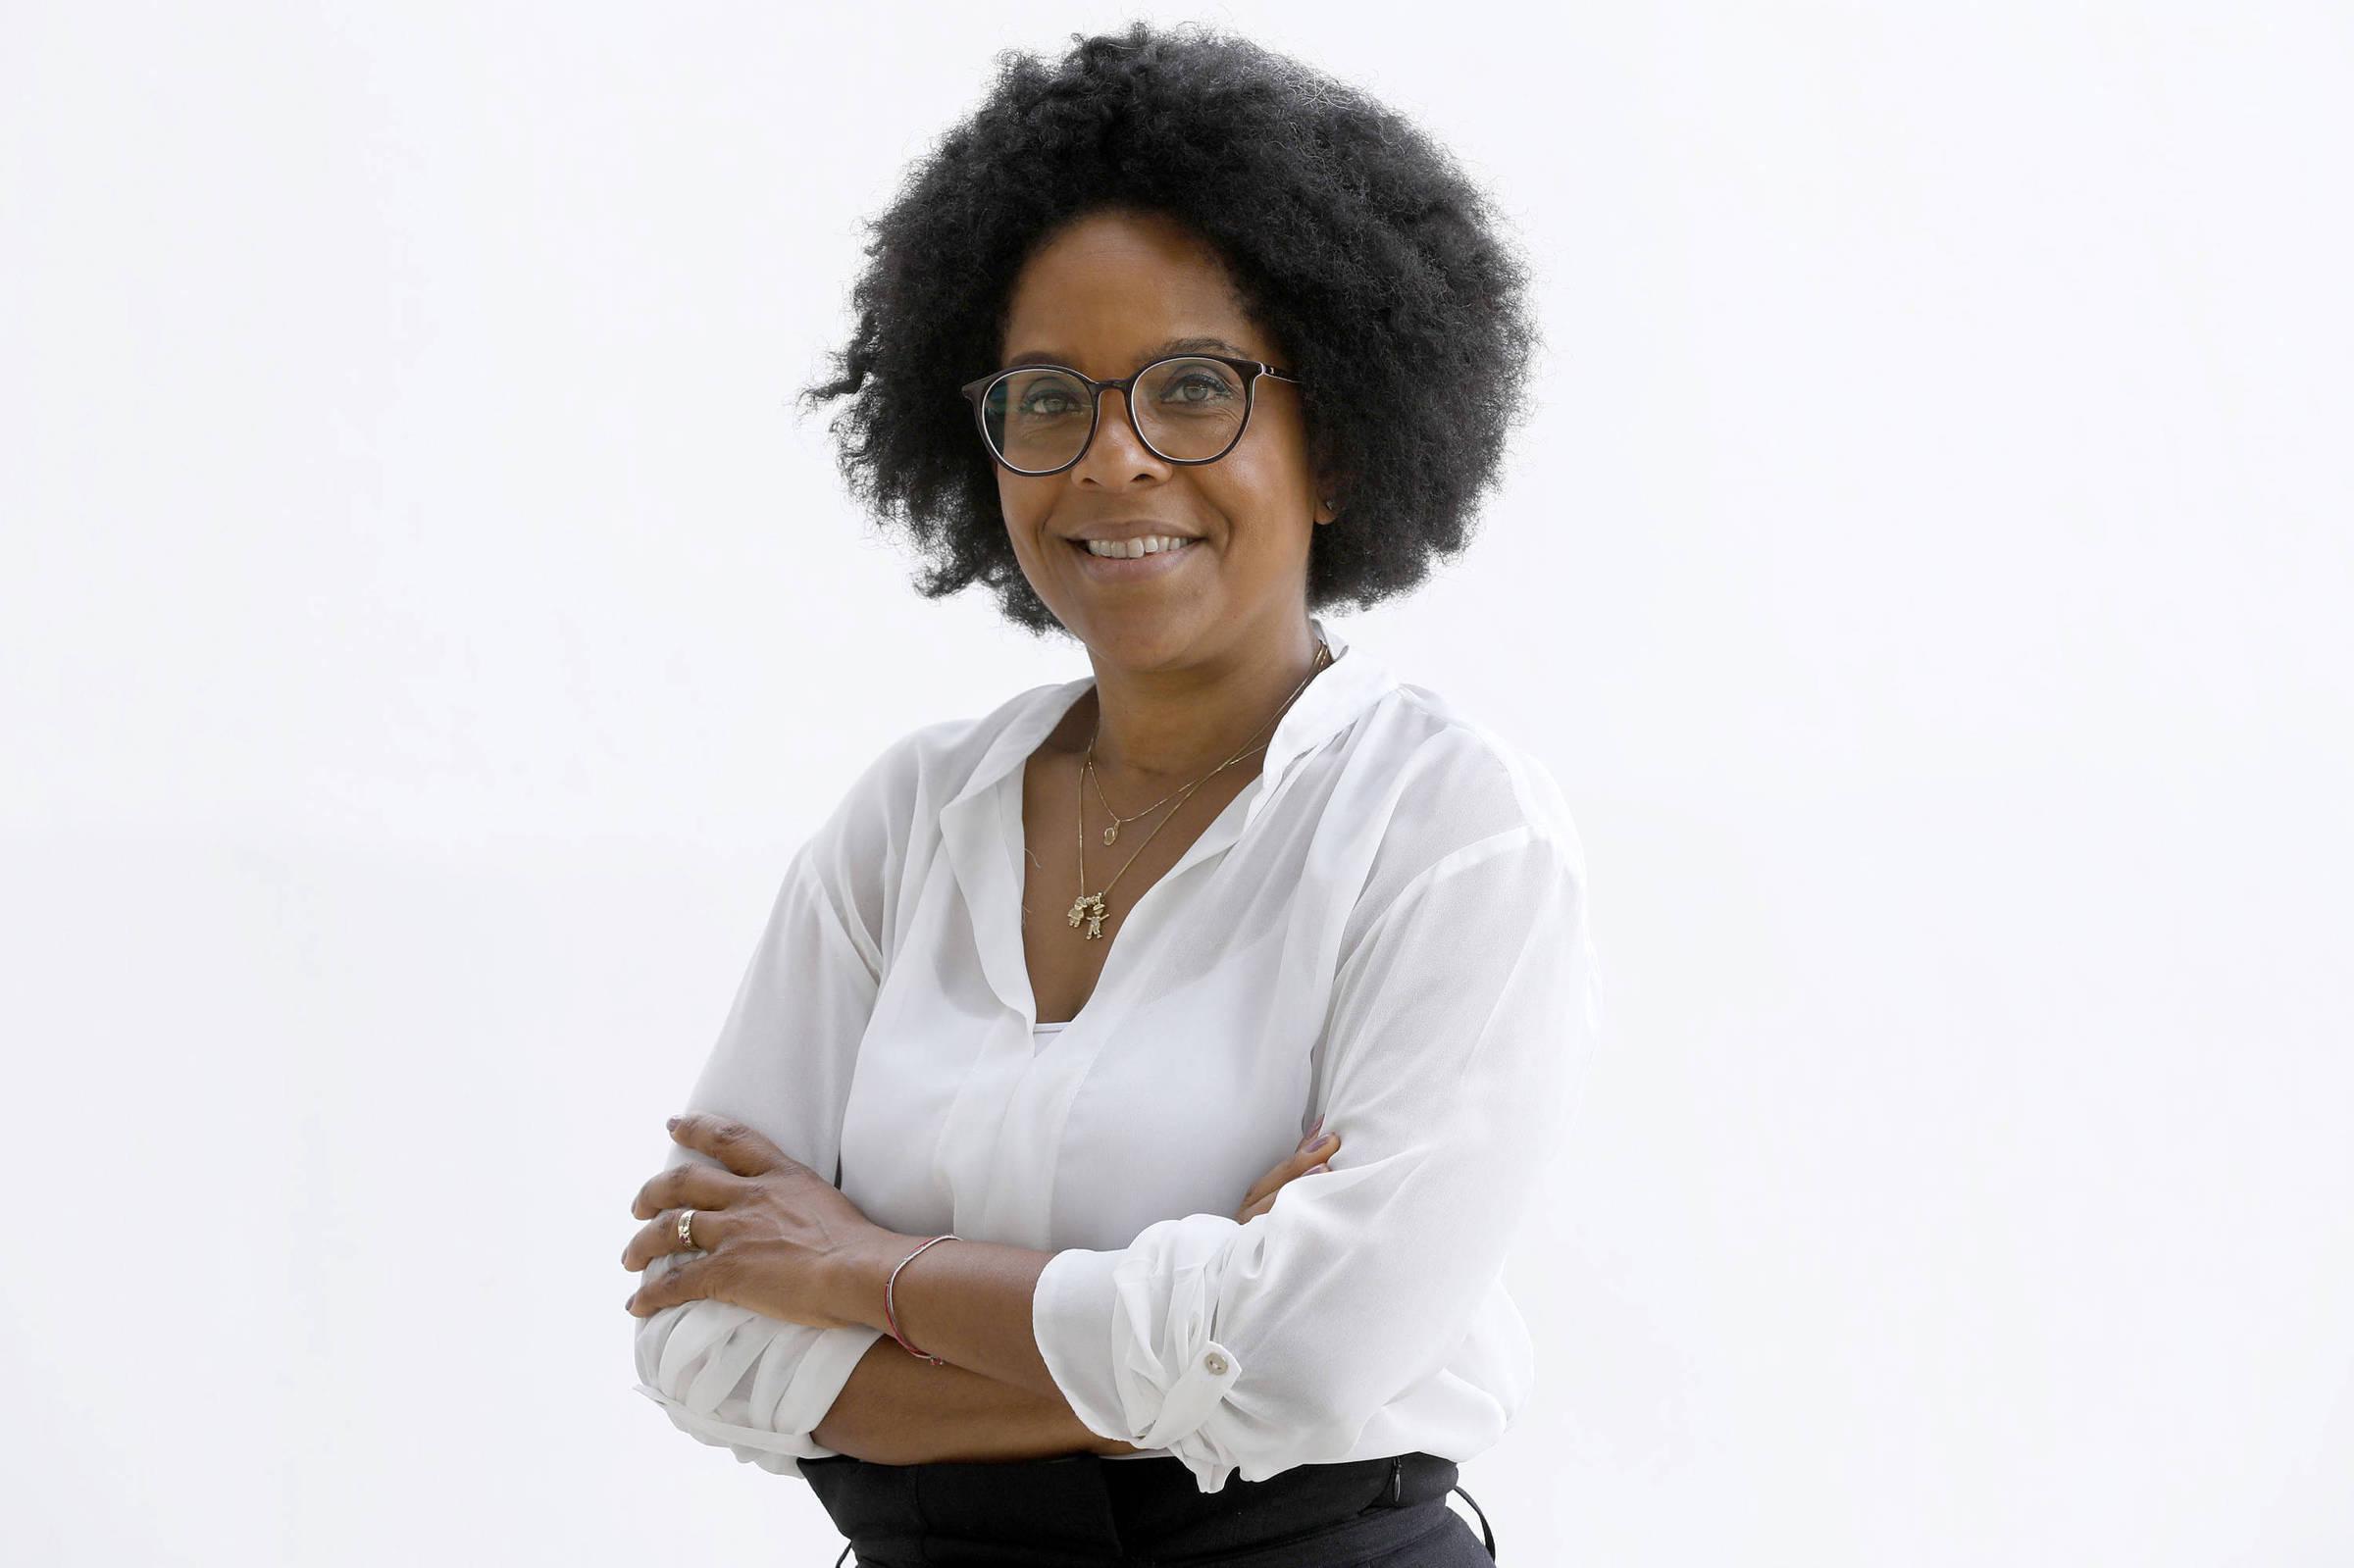 A jornalista Ana Cristina Rosa (Foto: Roberto Jayme/Ascom/TSE)